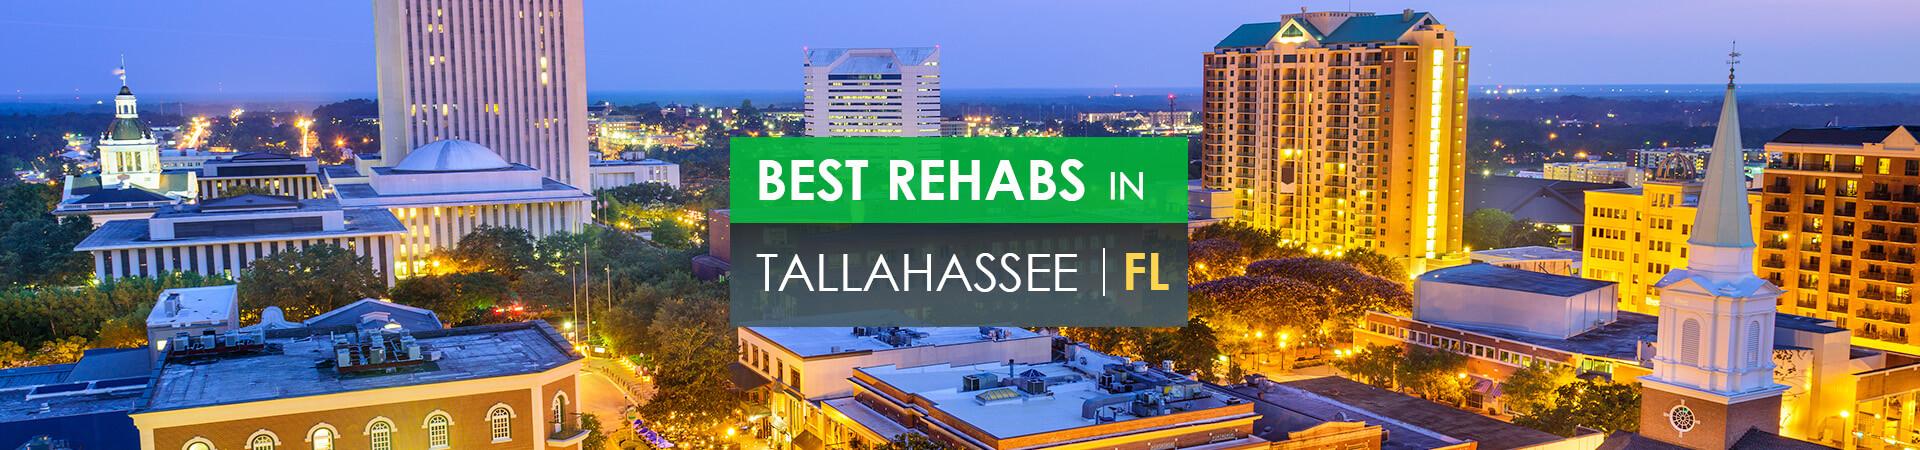 Best rehabs in Tallahassee, FL